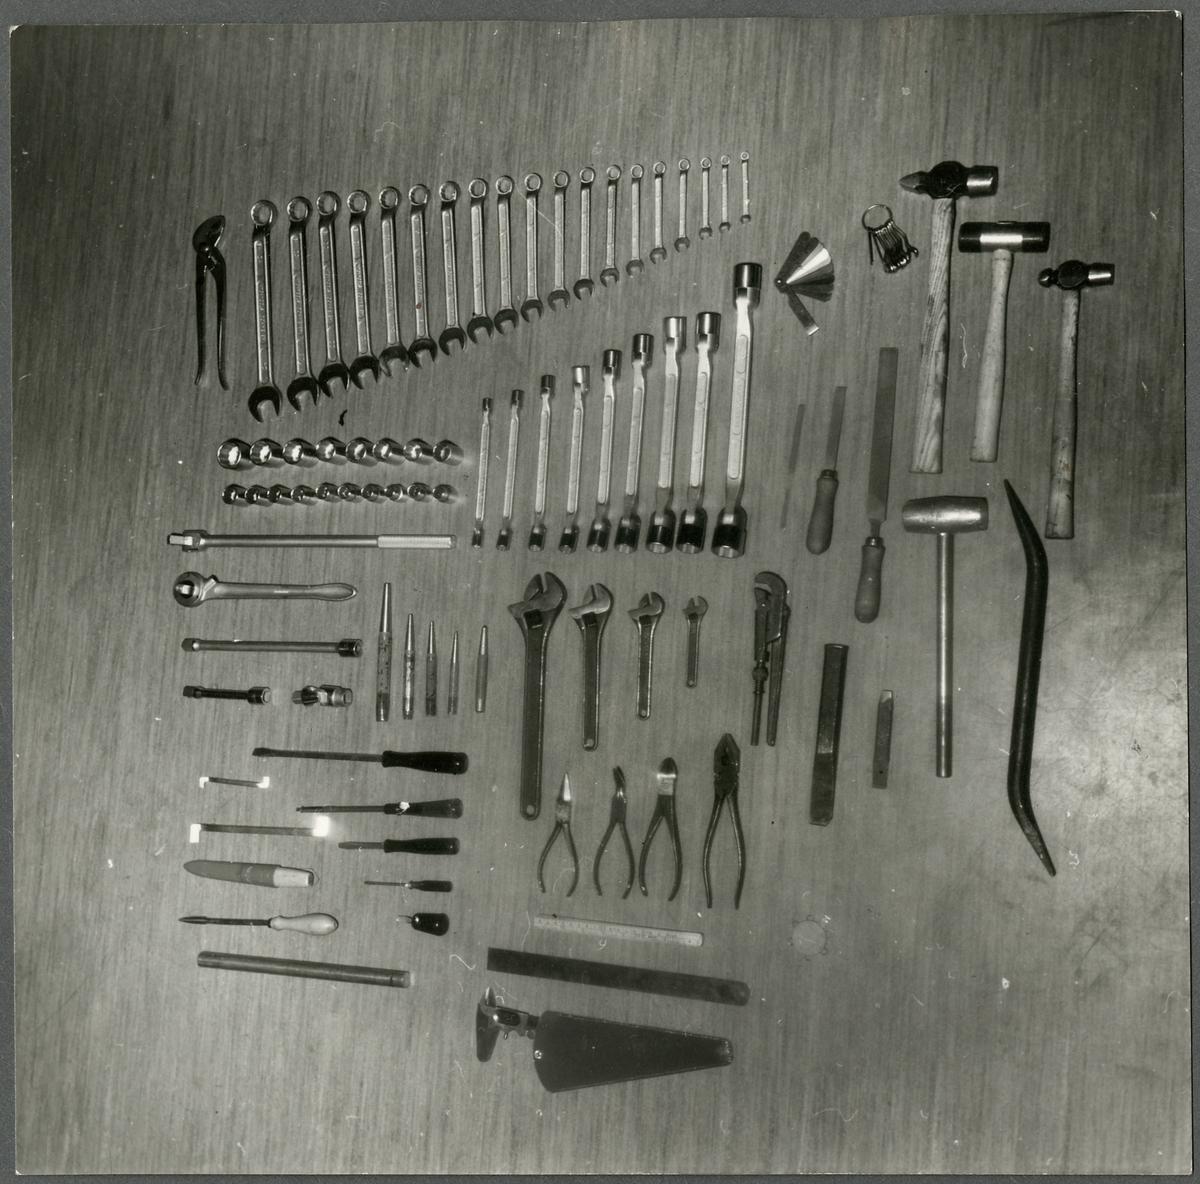 Detaljbild - Diverse verktyg.